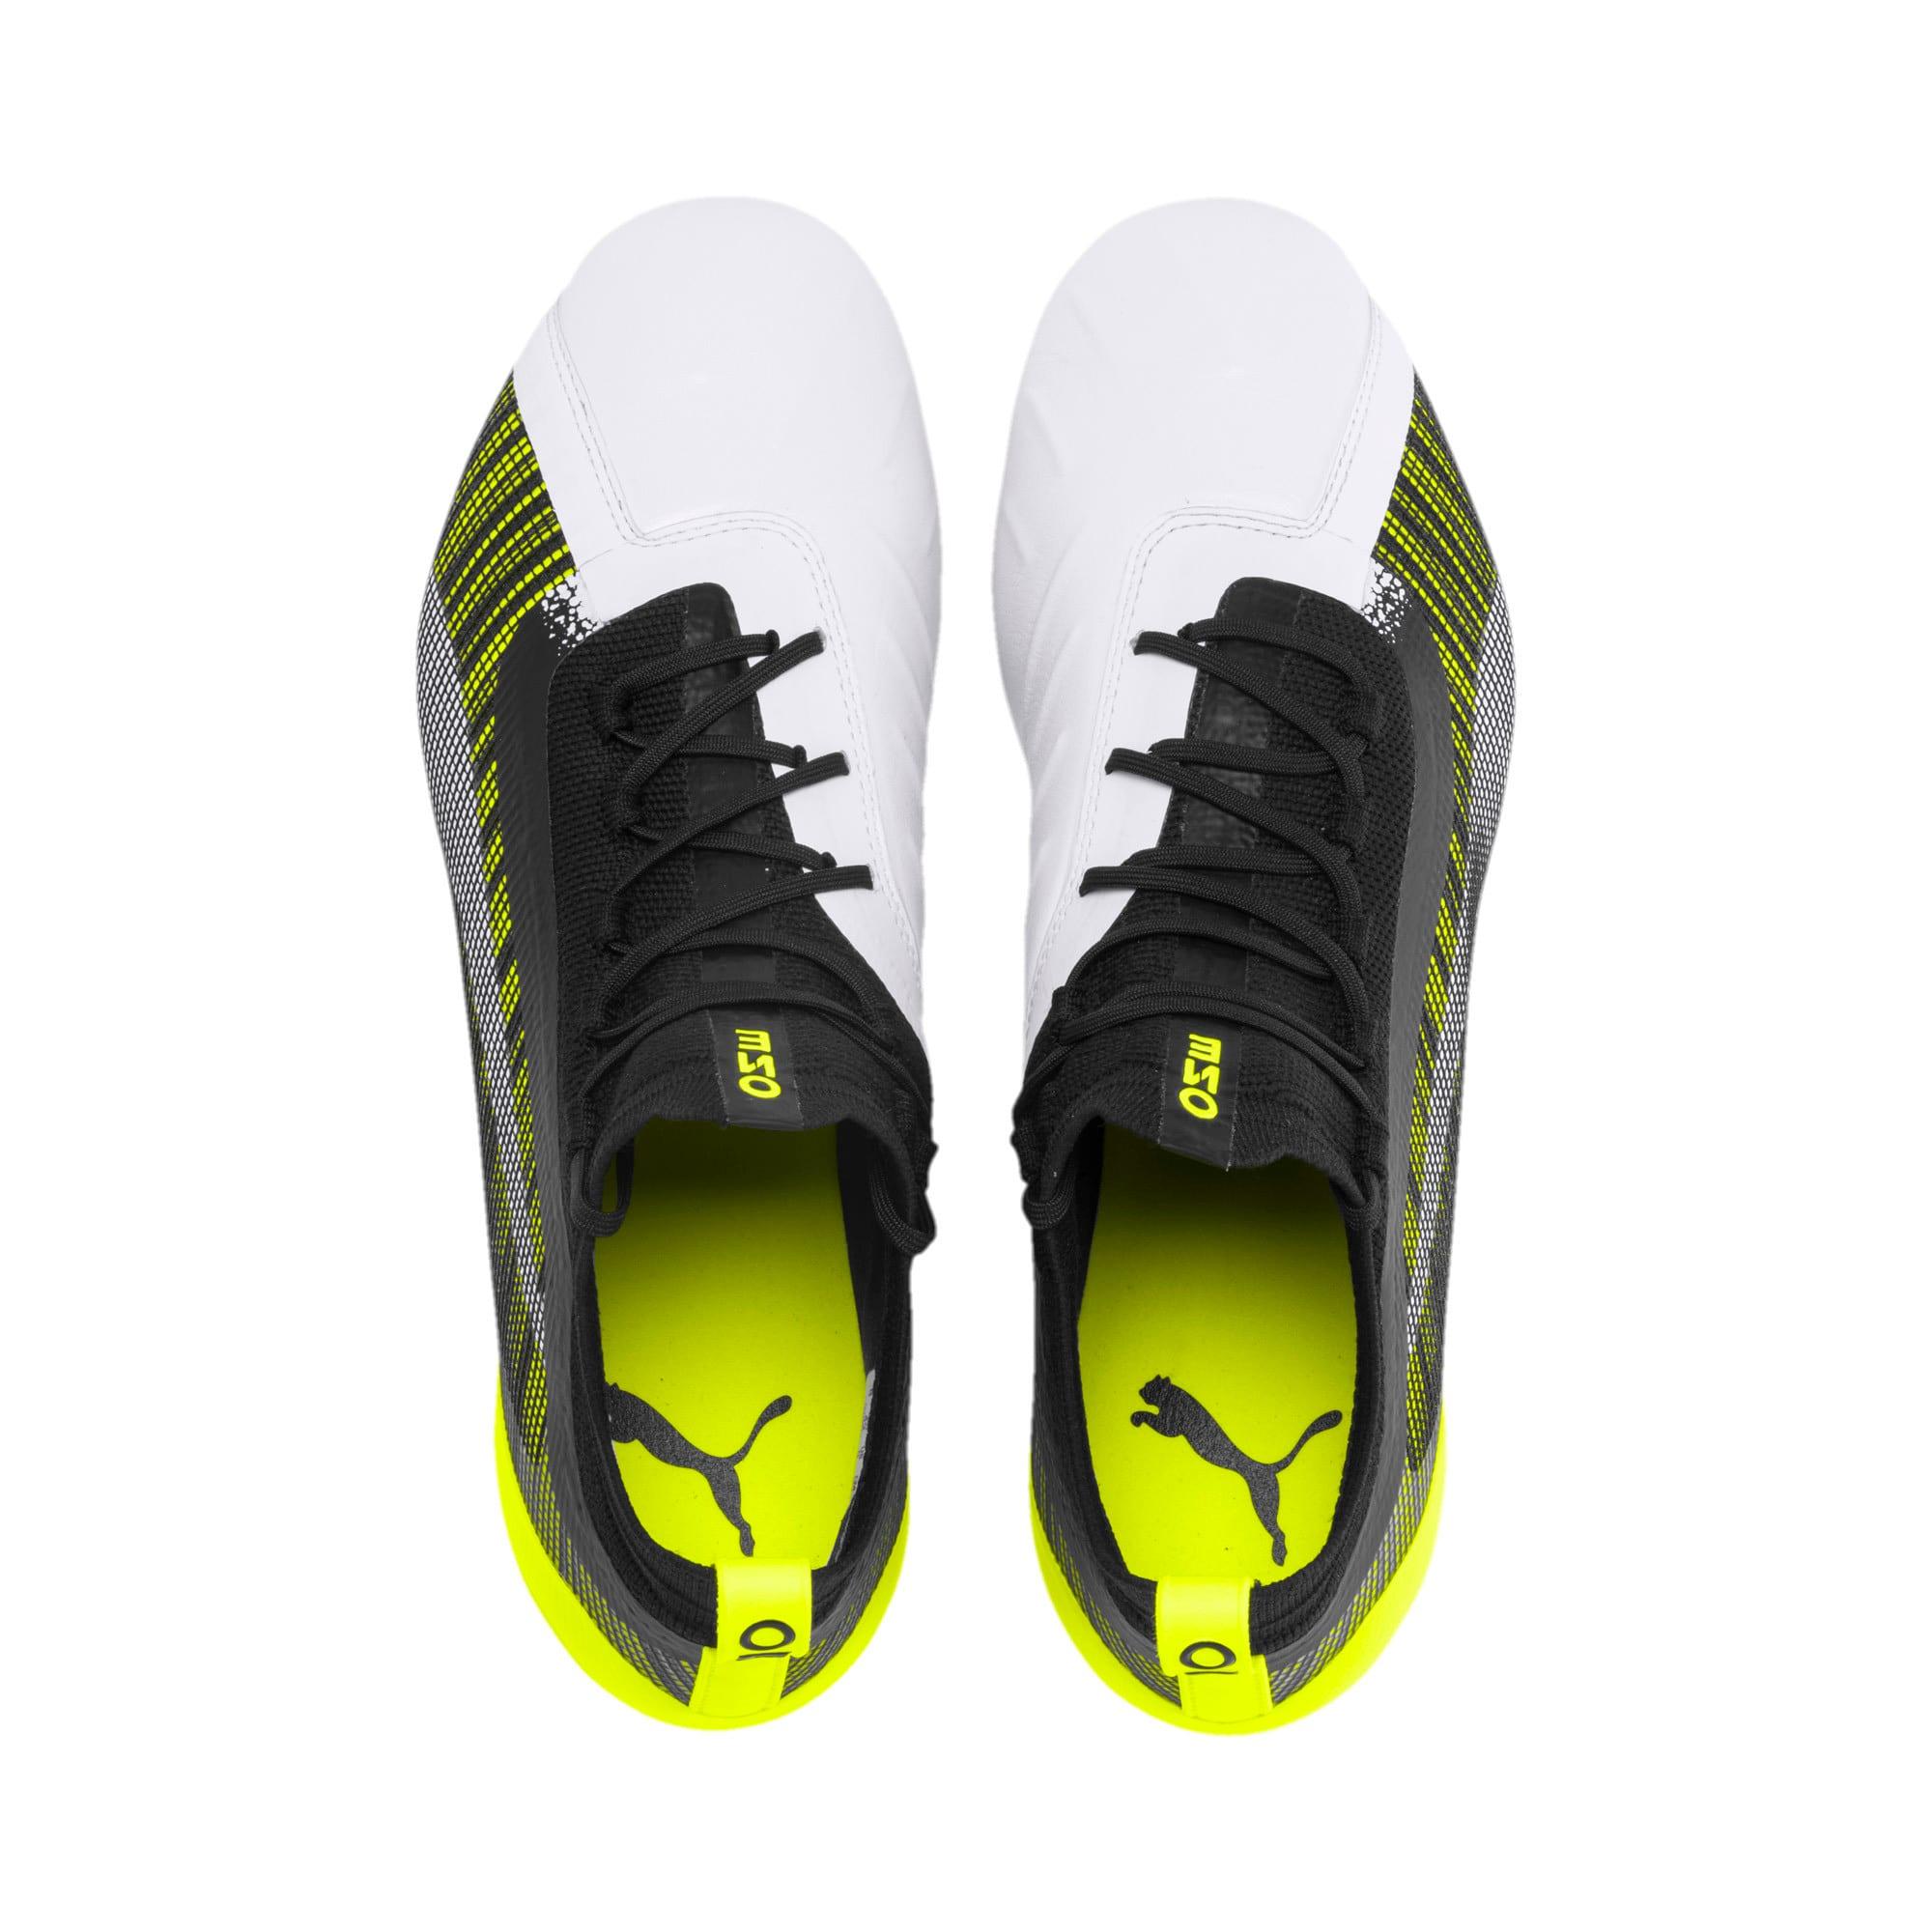 Thumbnail 7 of PUMA ONE 5.1 MxSG Football Boots, White-Black-Yellow Alert, medium